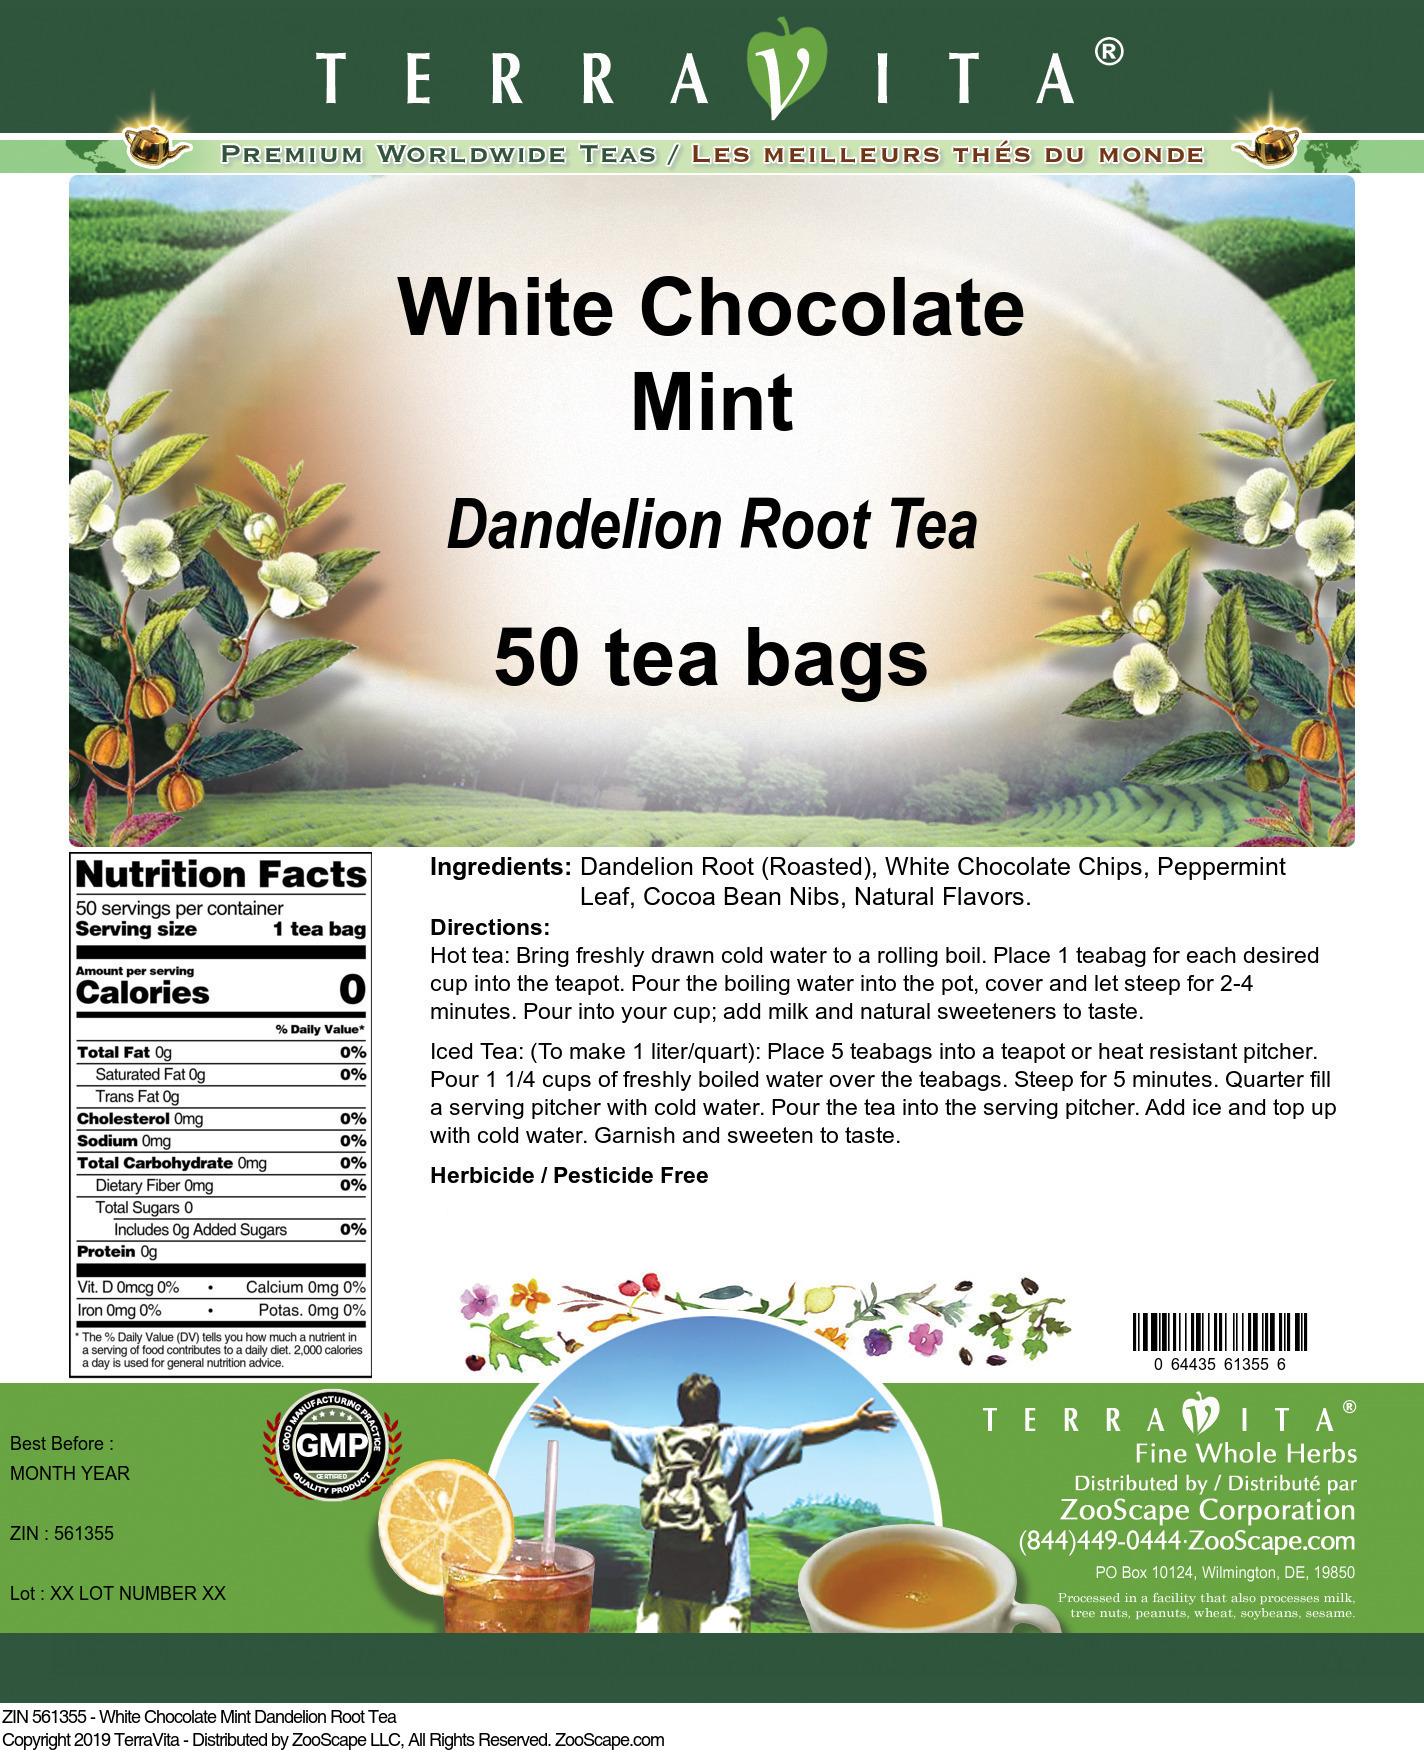 White Chocolate Mint Dandelion Root Tea